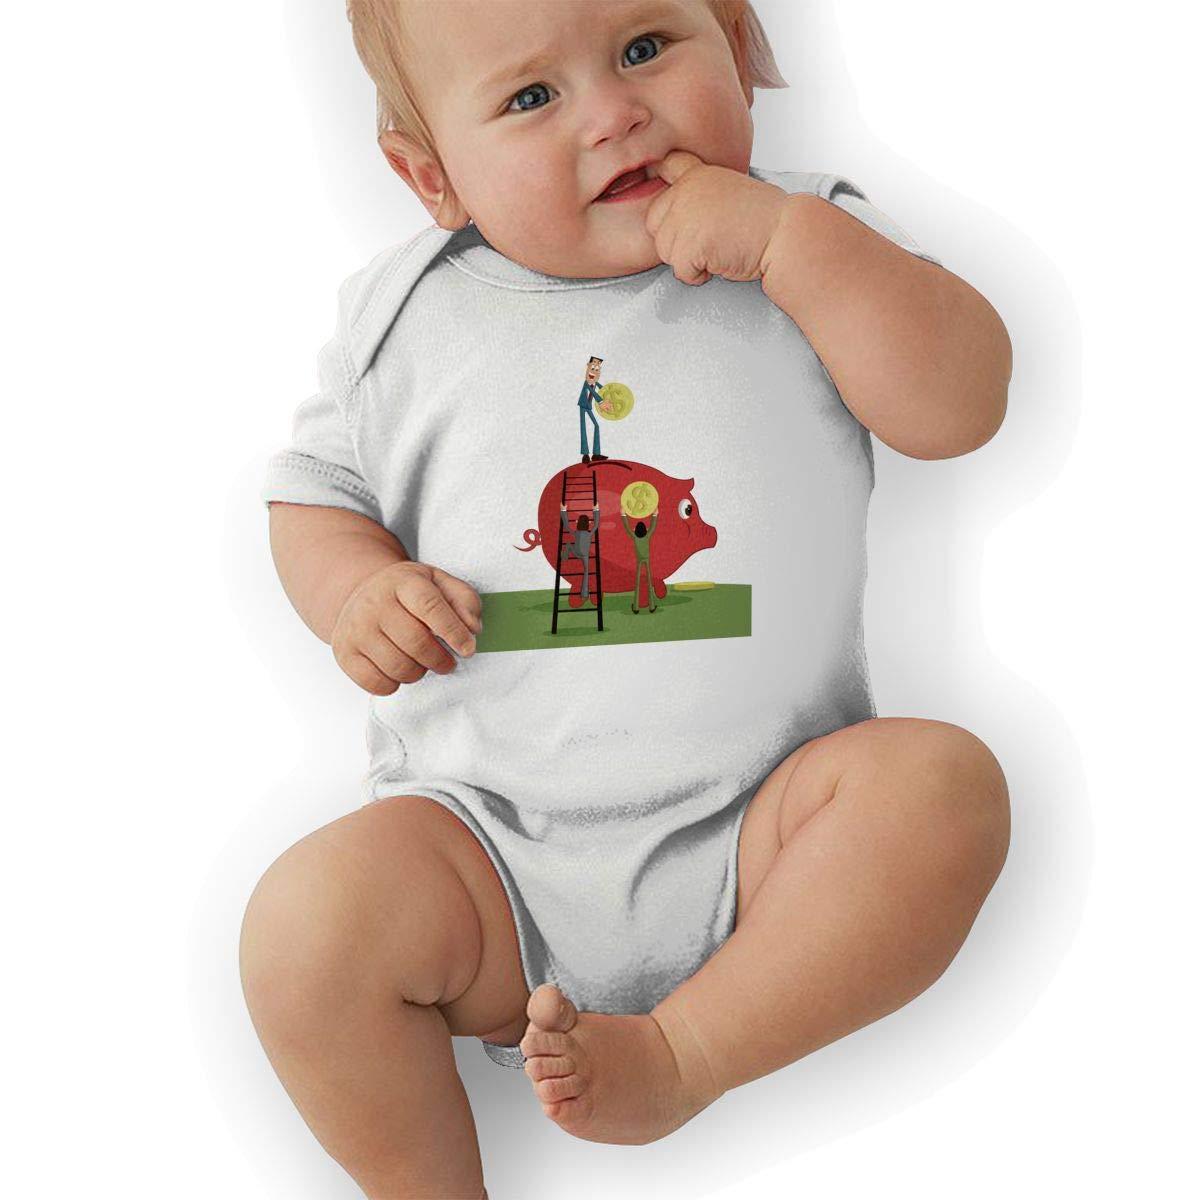 Infant Baby Boys Bodysuit Short-Sleeve Onesie Creative Business Print Rompers Autumn Pajamas